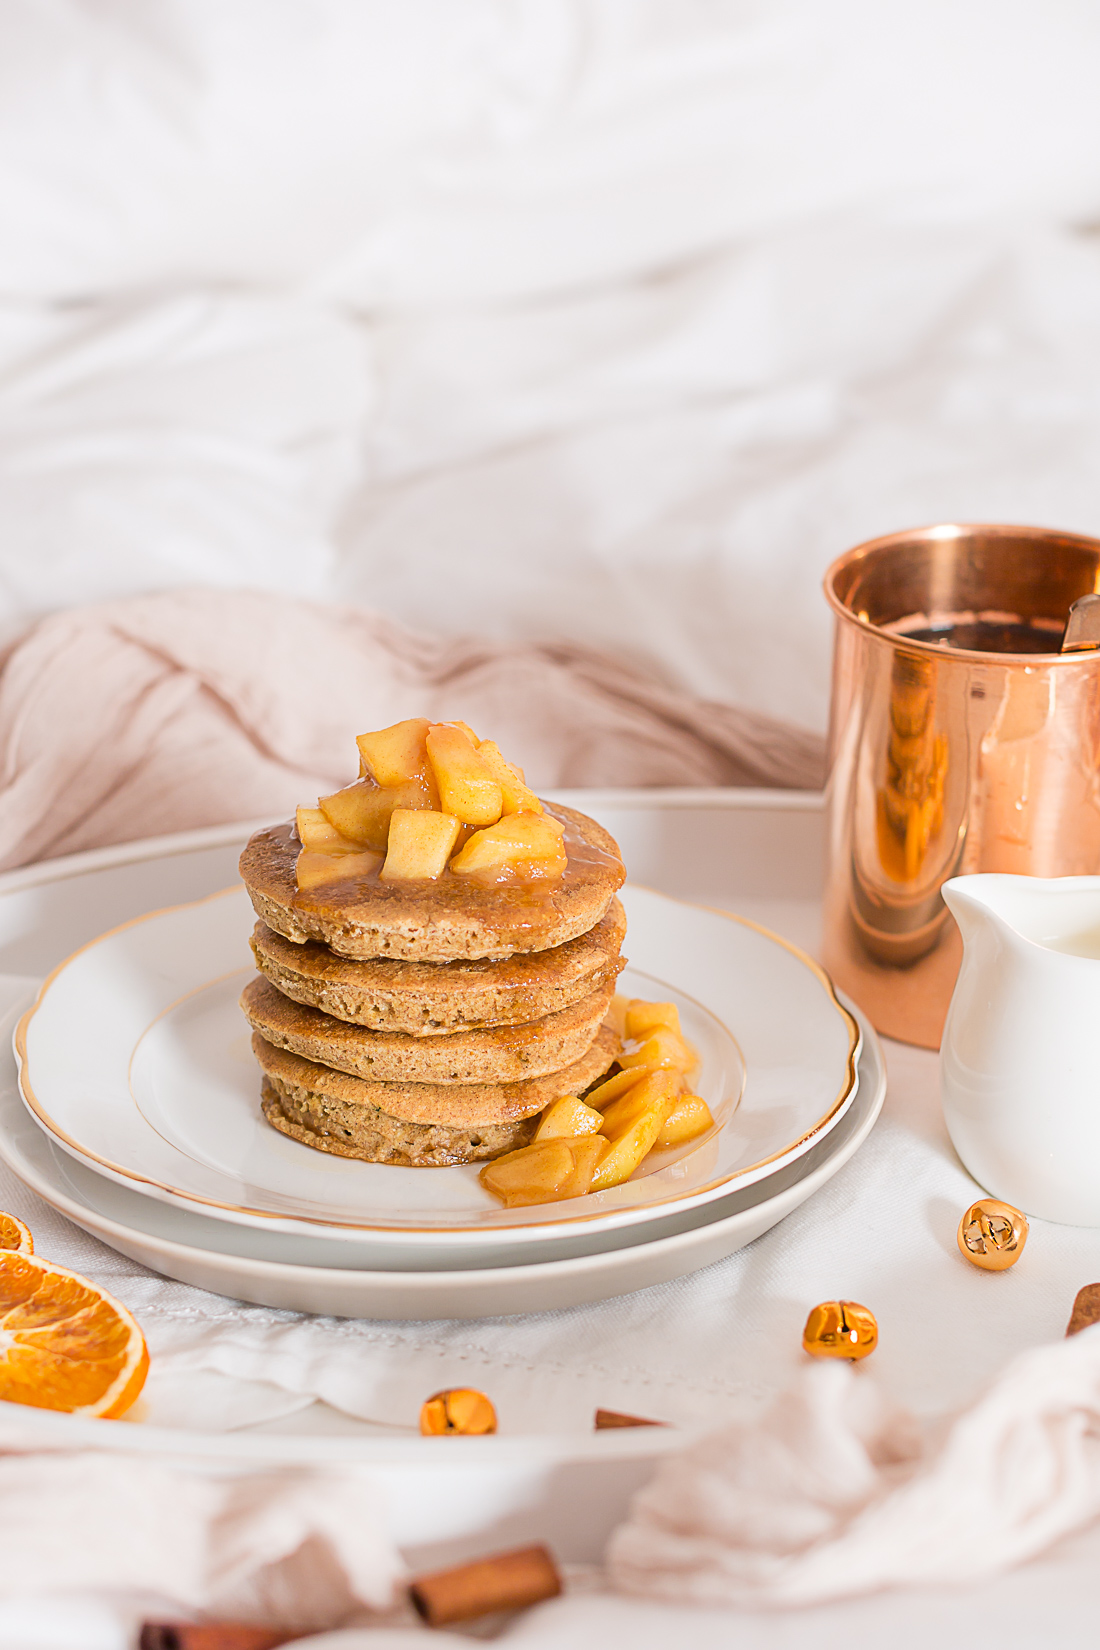 PANCAKES INTEGRALI alla CANNELLA e MELE CARAMELLATE –  senza zucchero – senza uova – vegan